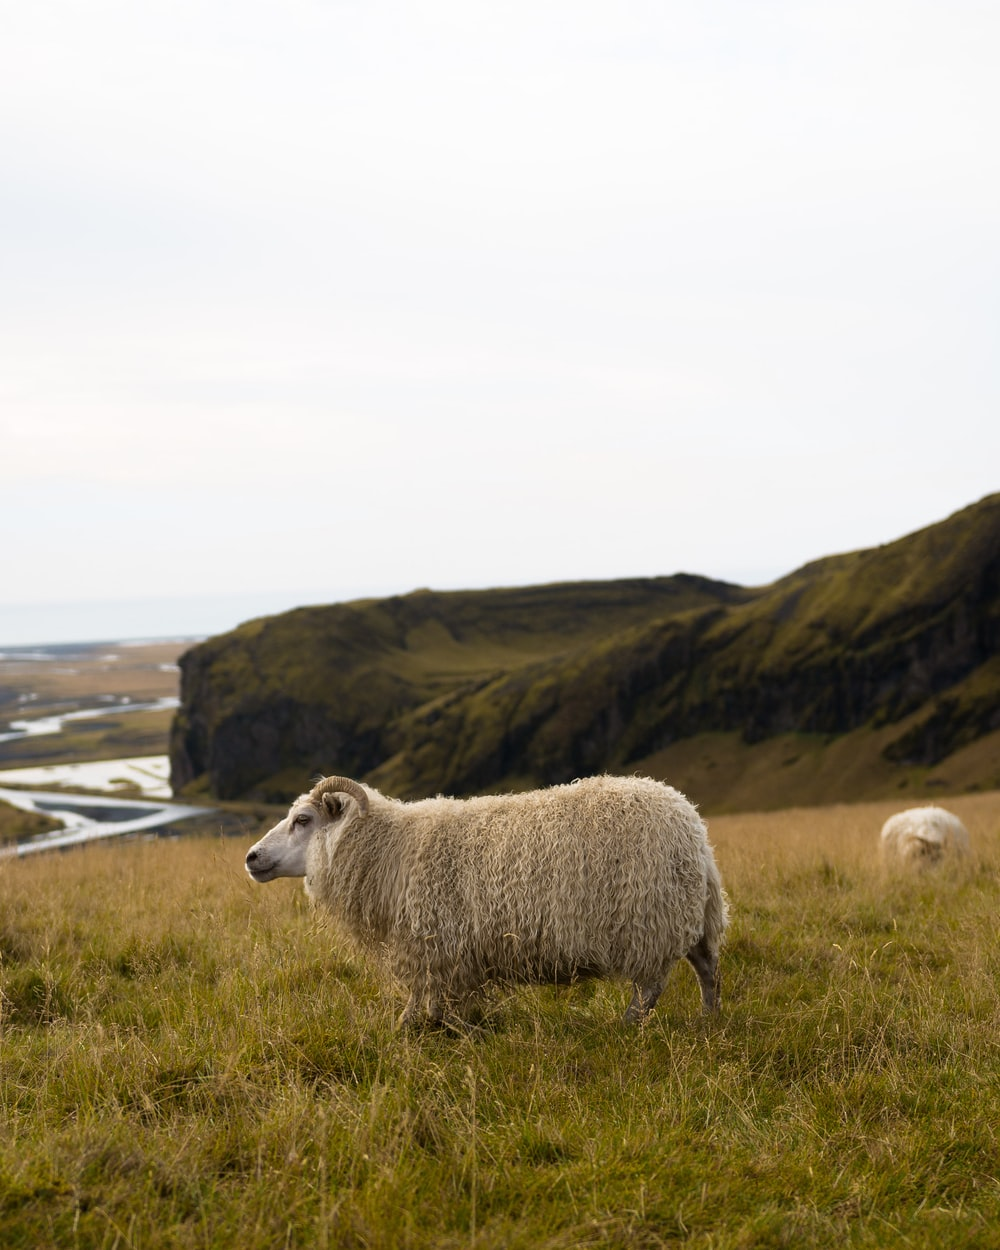 lamb standing on grass field near mountain range